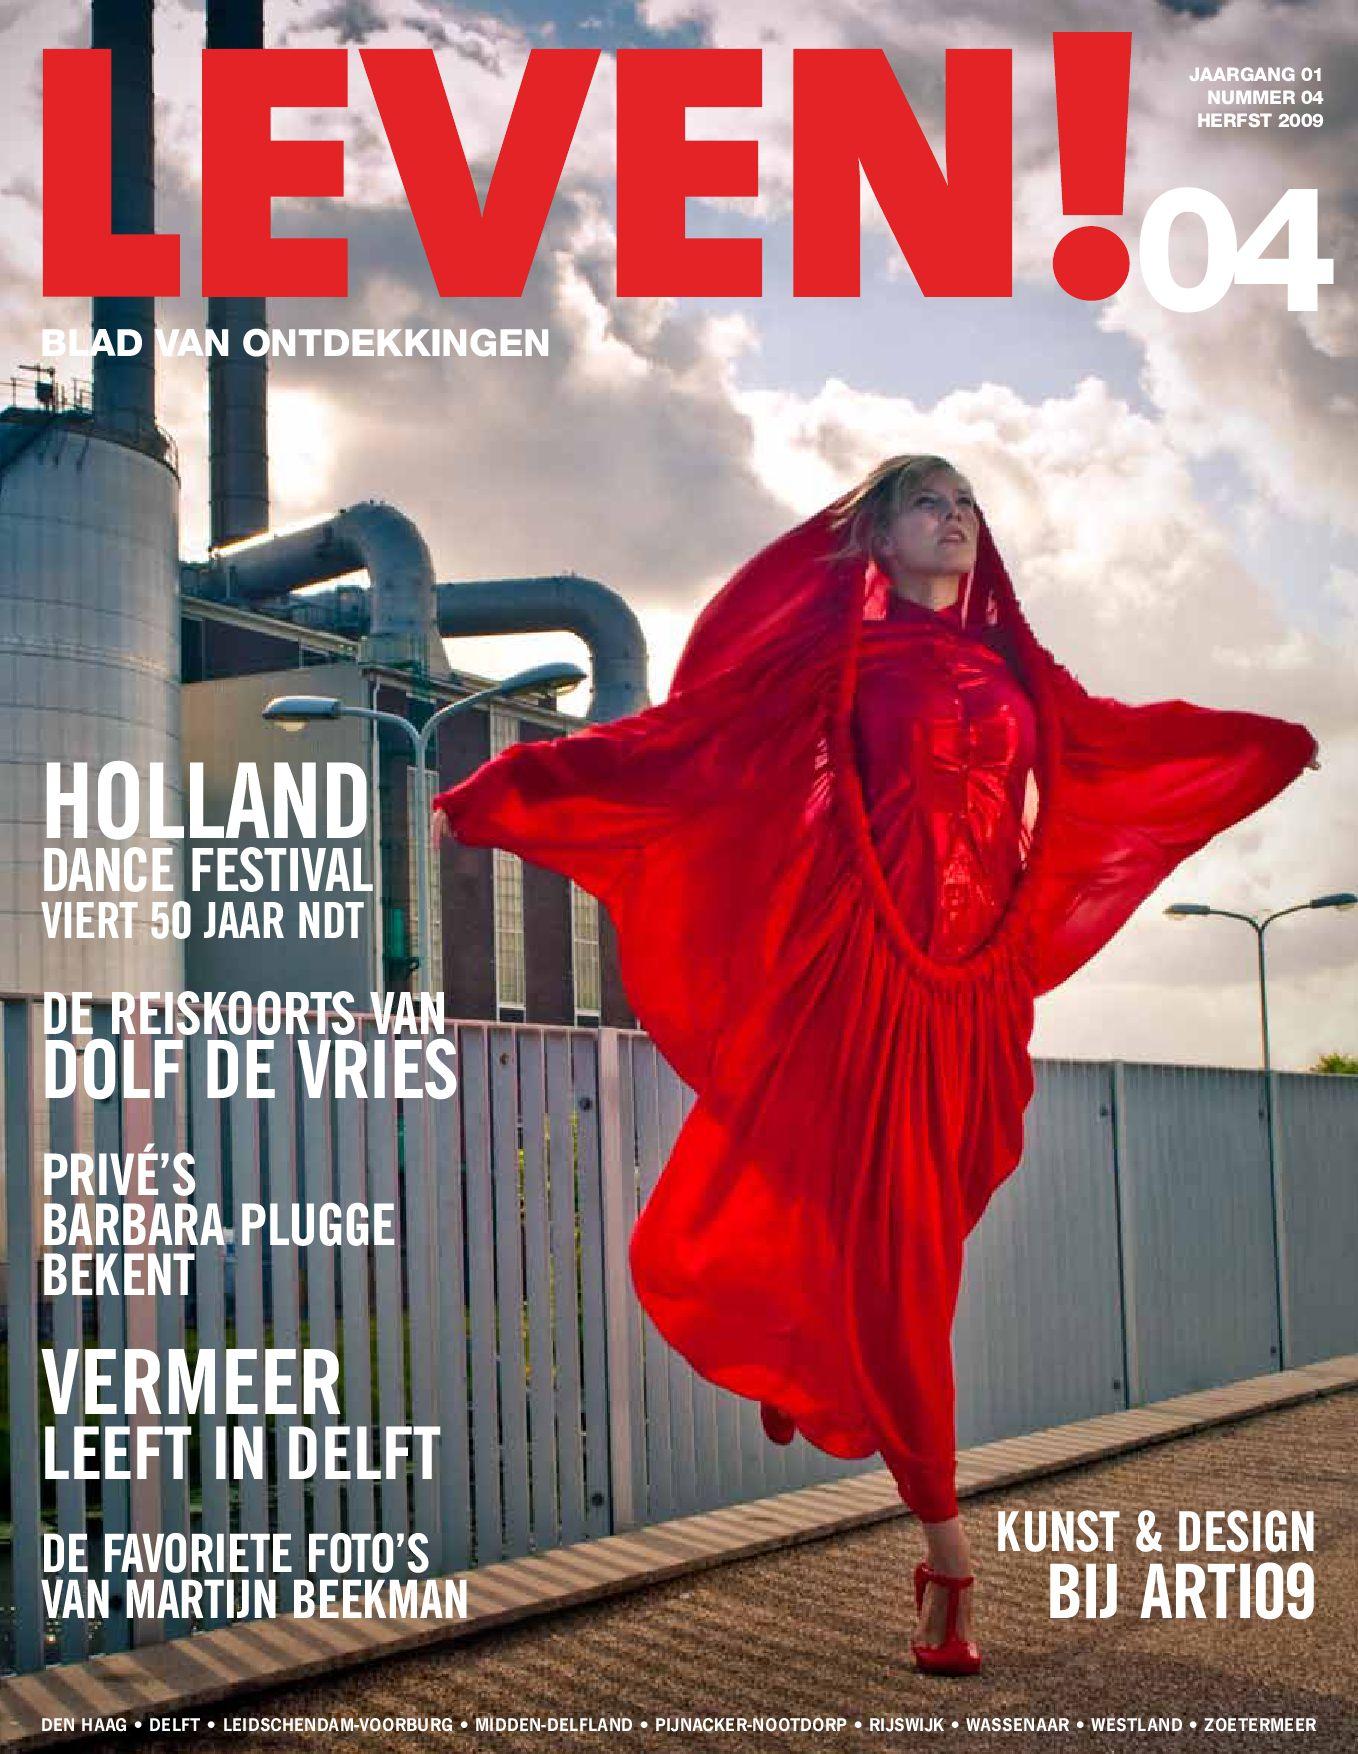 LEVEN! regio Den Haag #31 by CieremansVanReijn - issuu